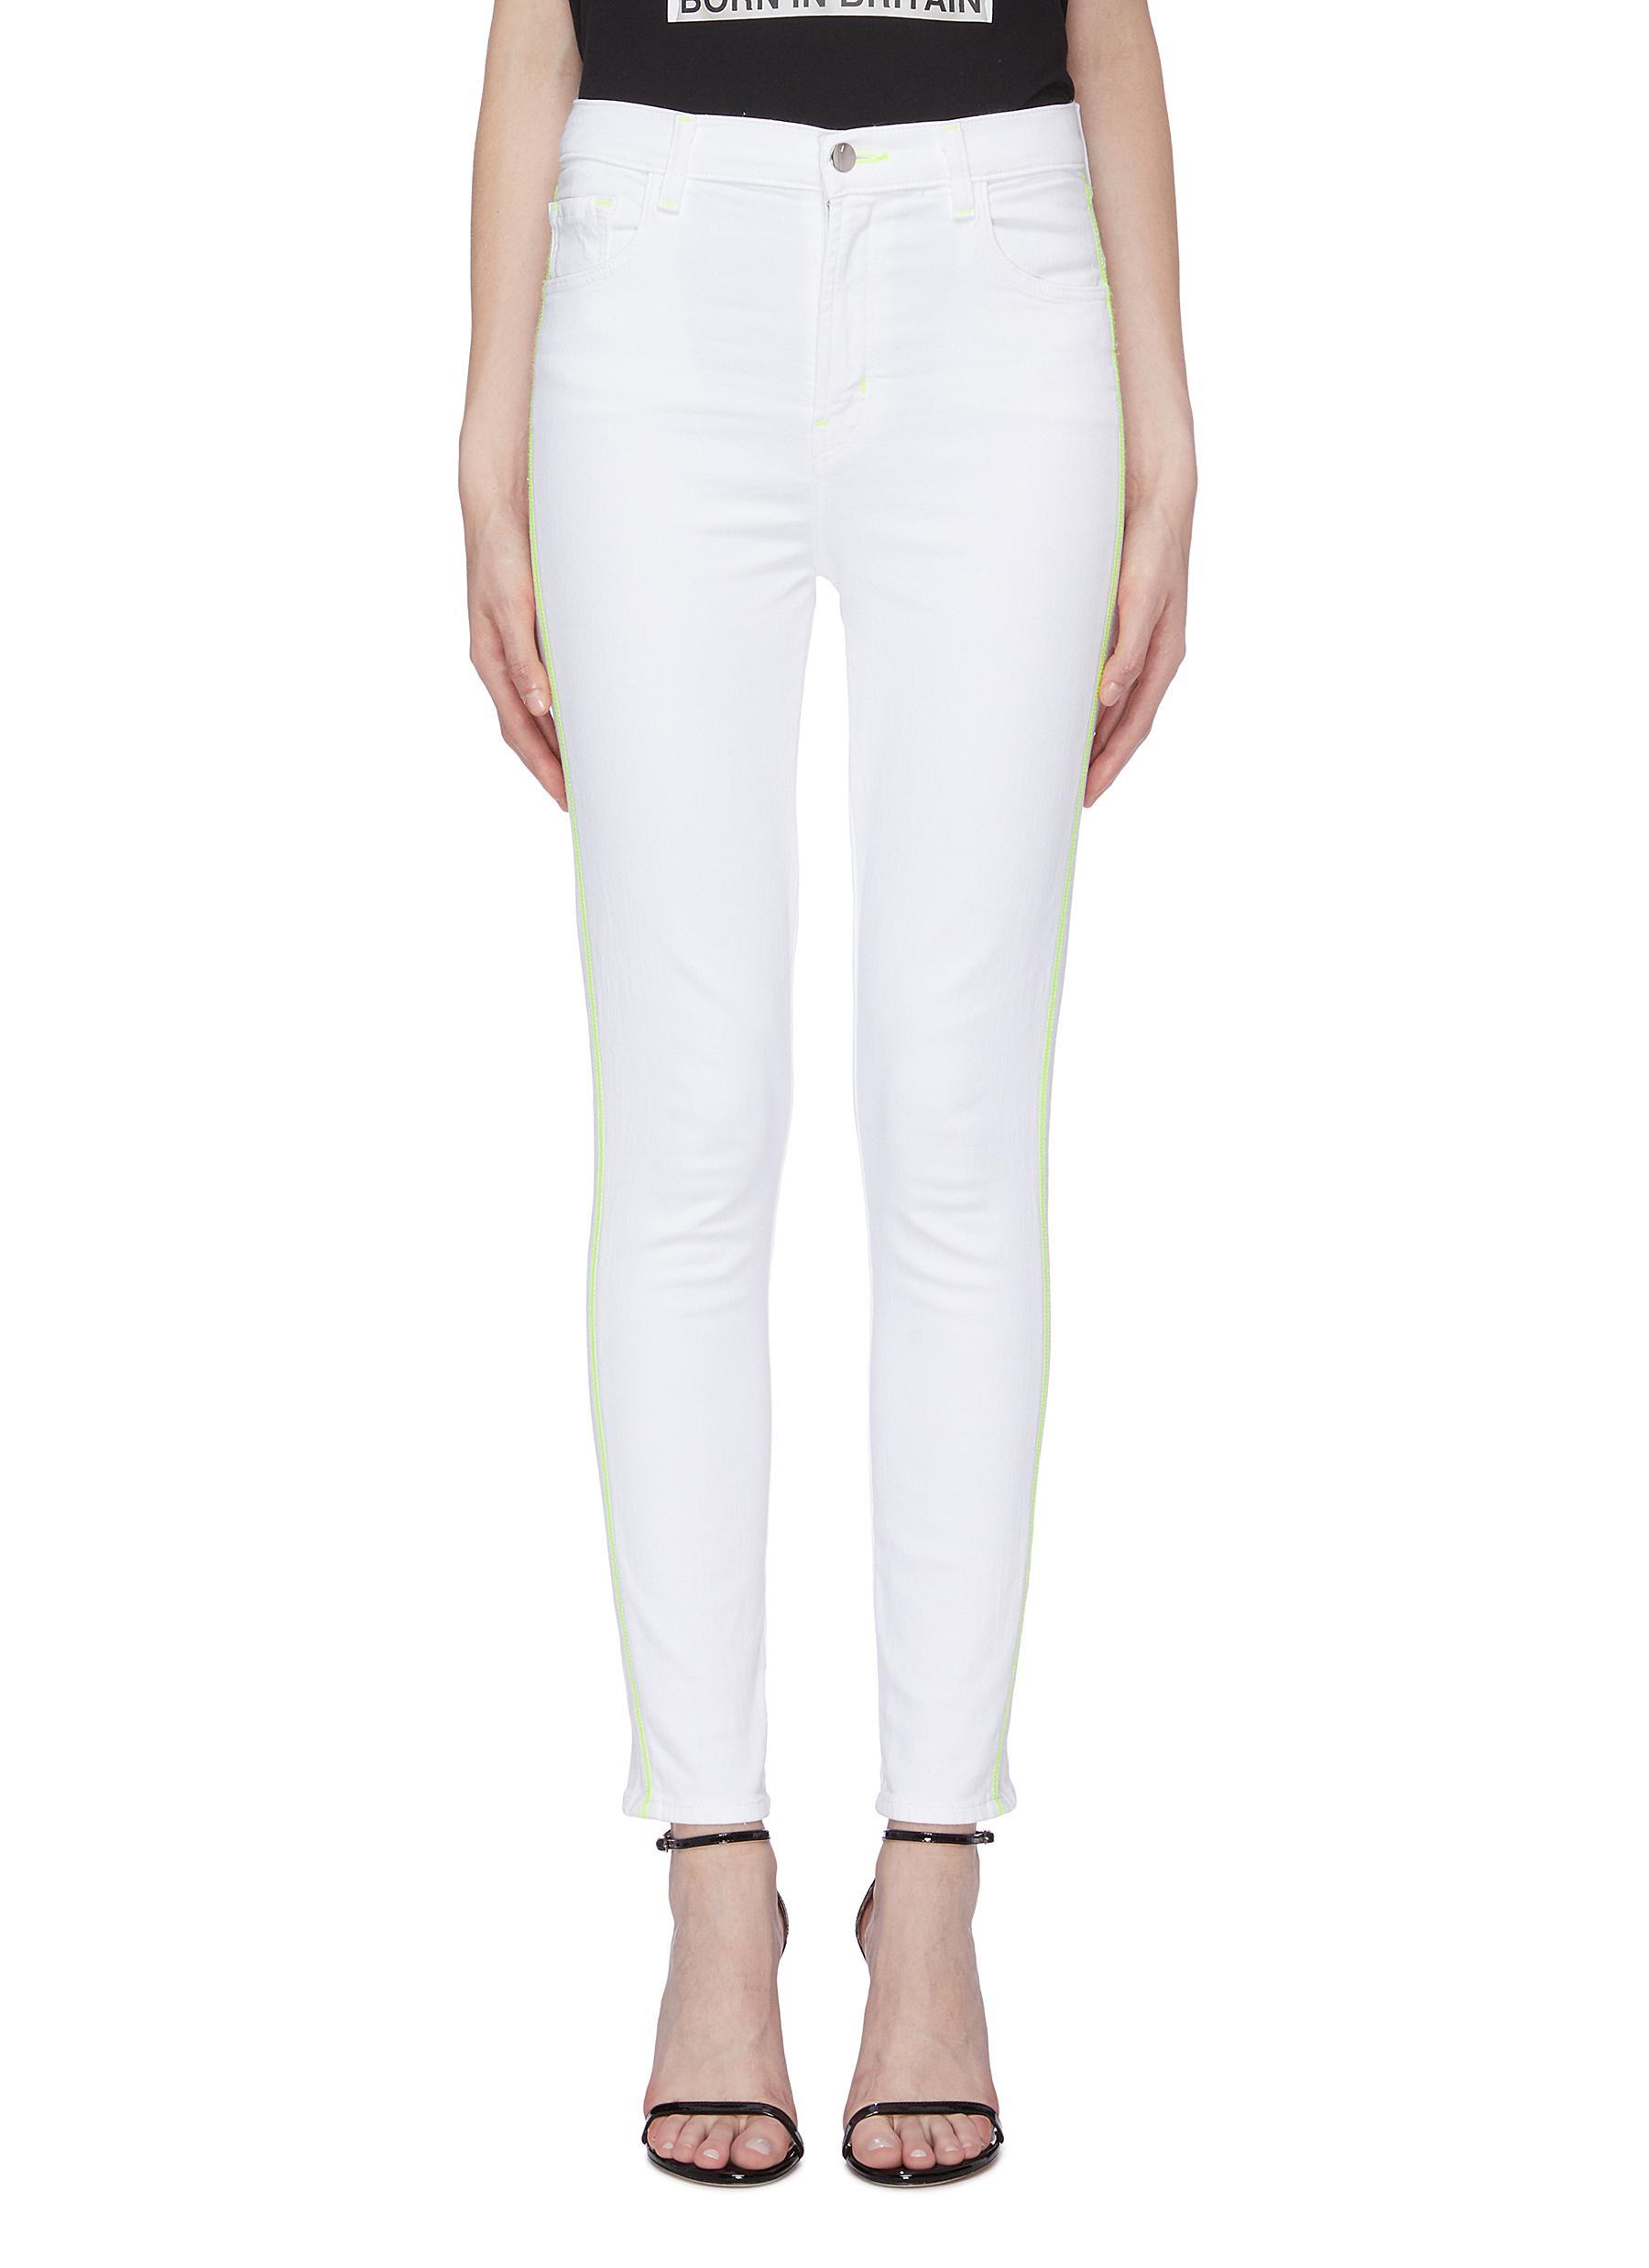 Leenah stripe outseam skinny jeans by J Brand